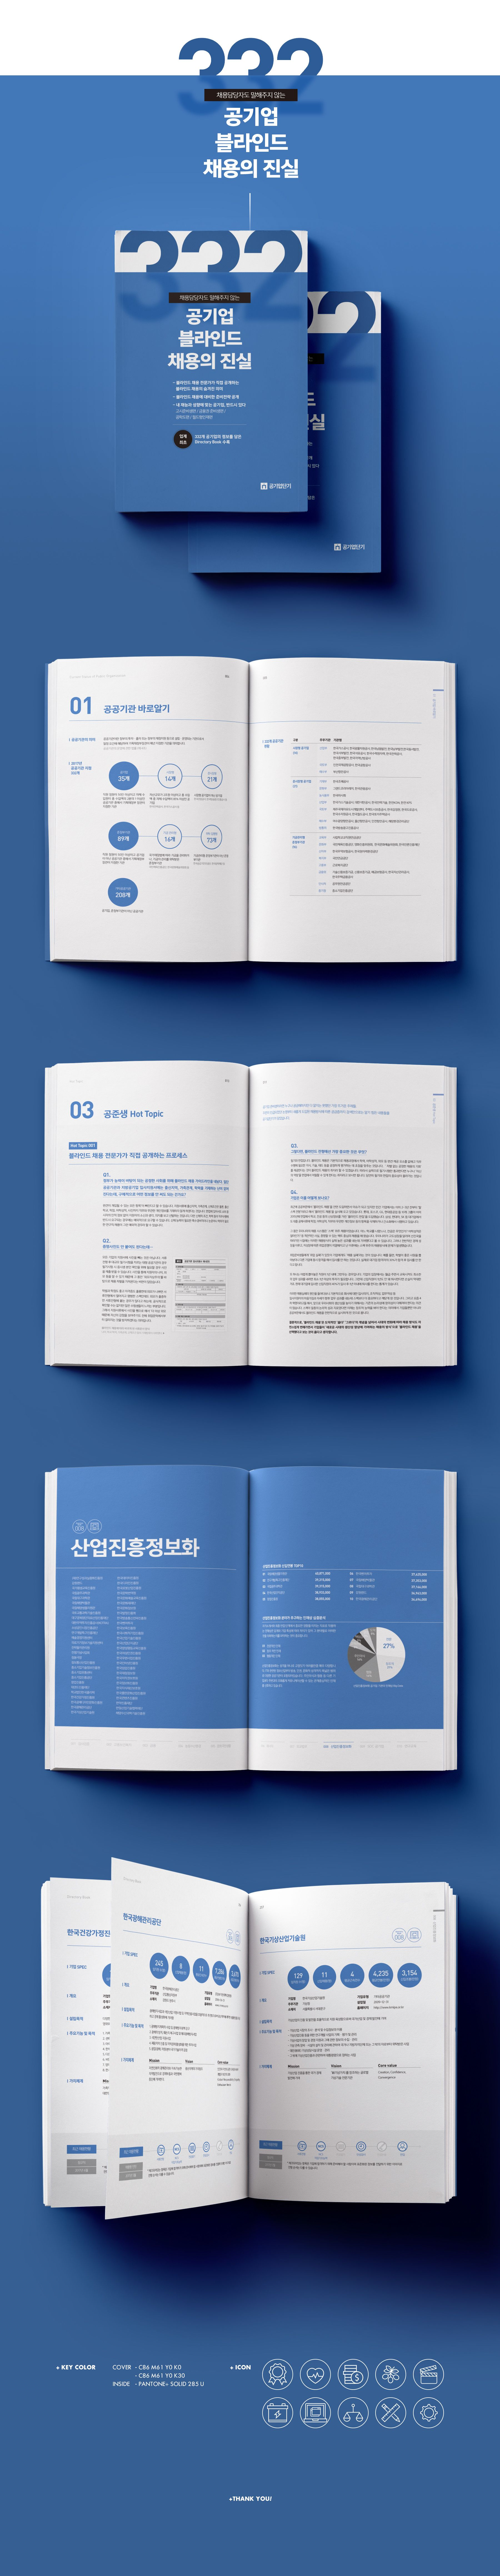 Publicdangi - 332 guide book | koria | Pinterest